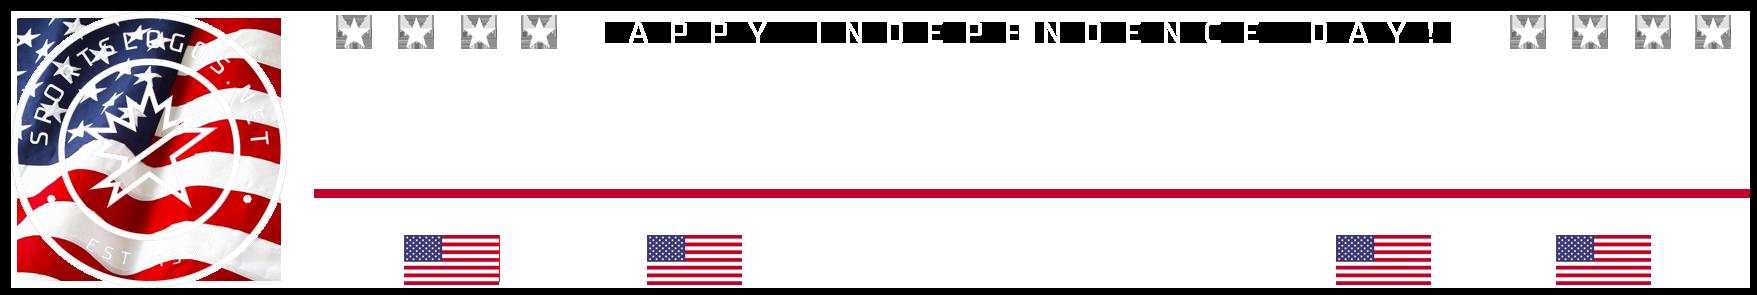 SportsLogos.Net News